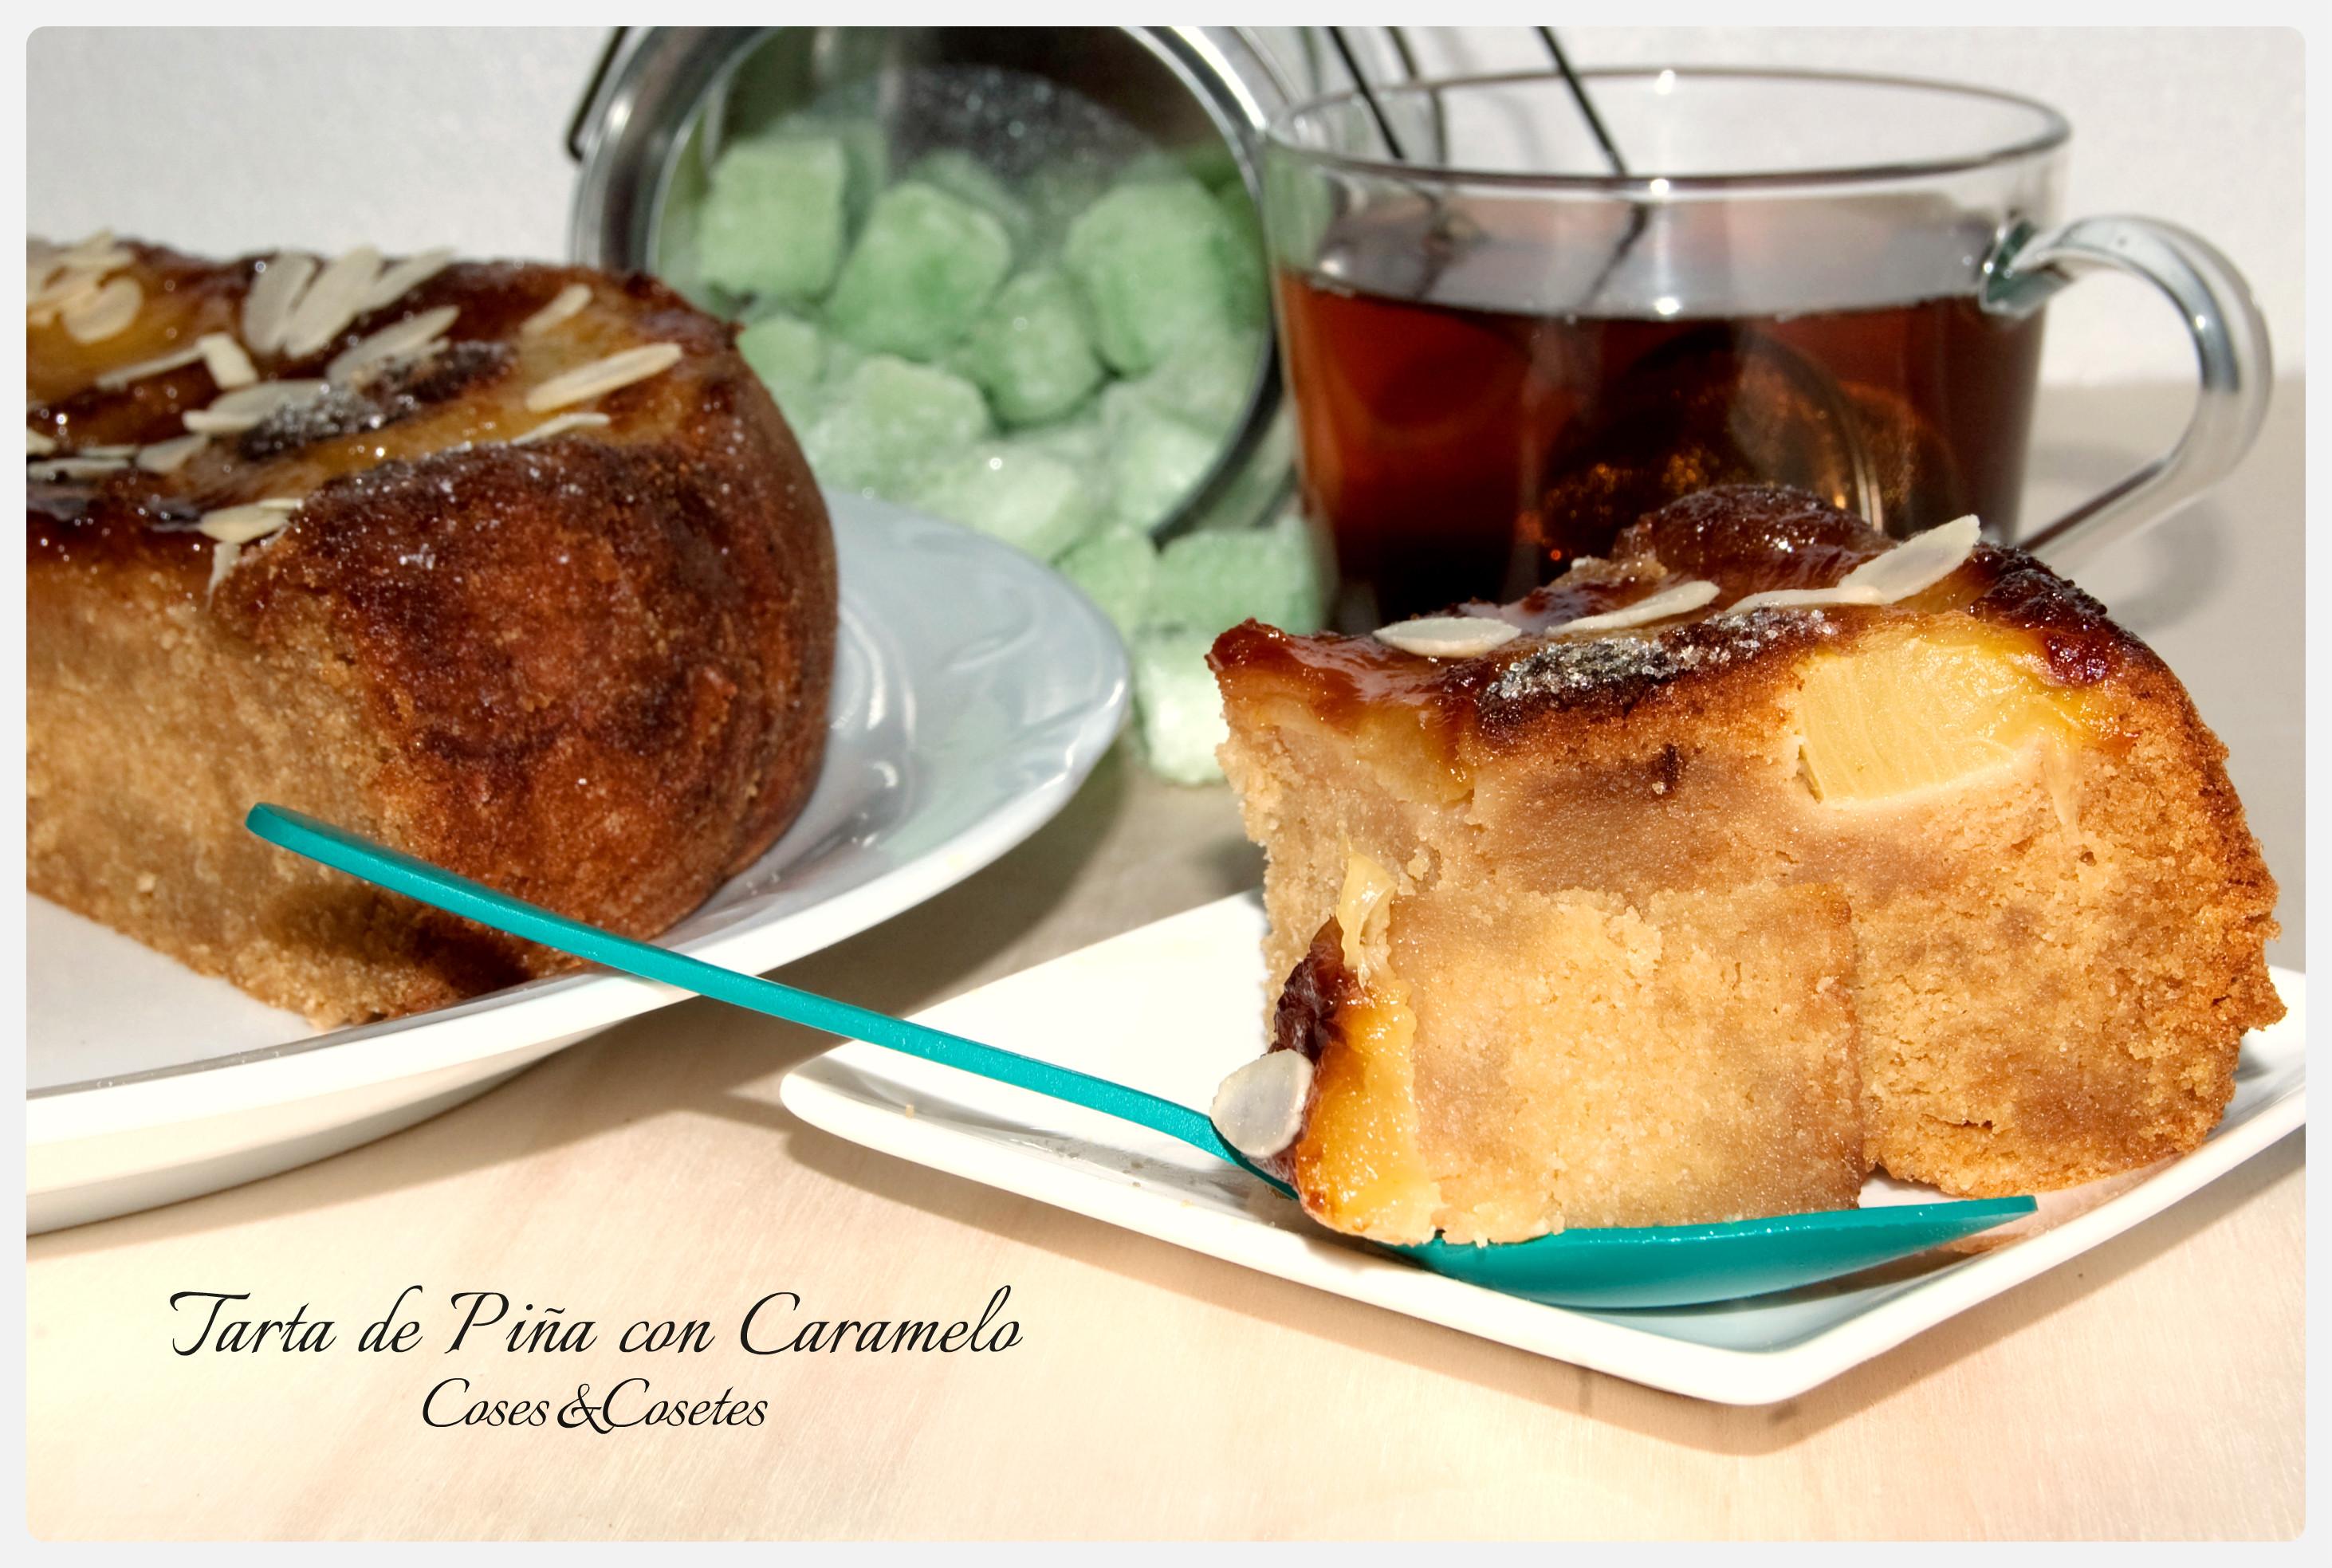 Tarta Pina caramelo